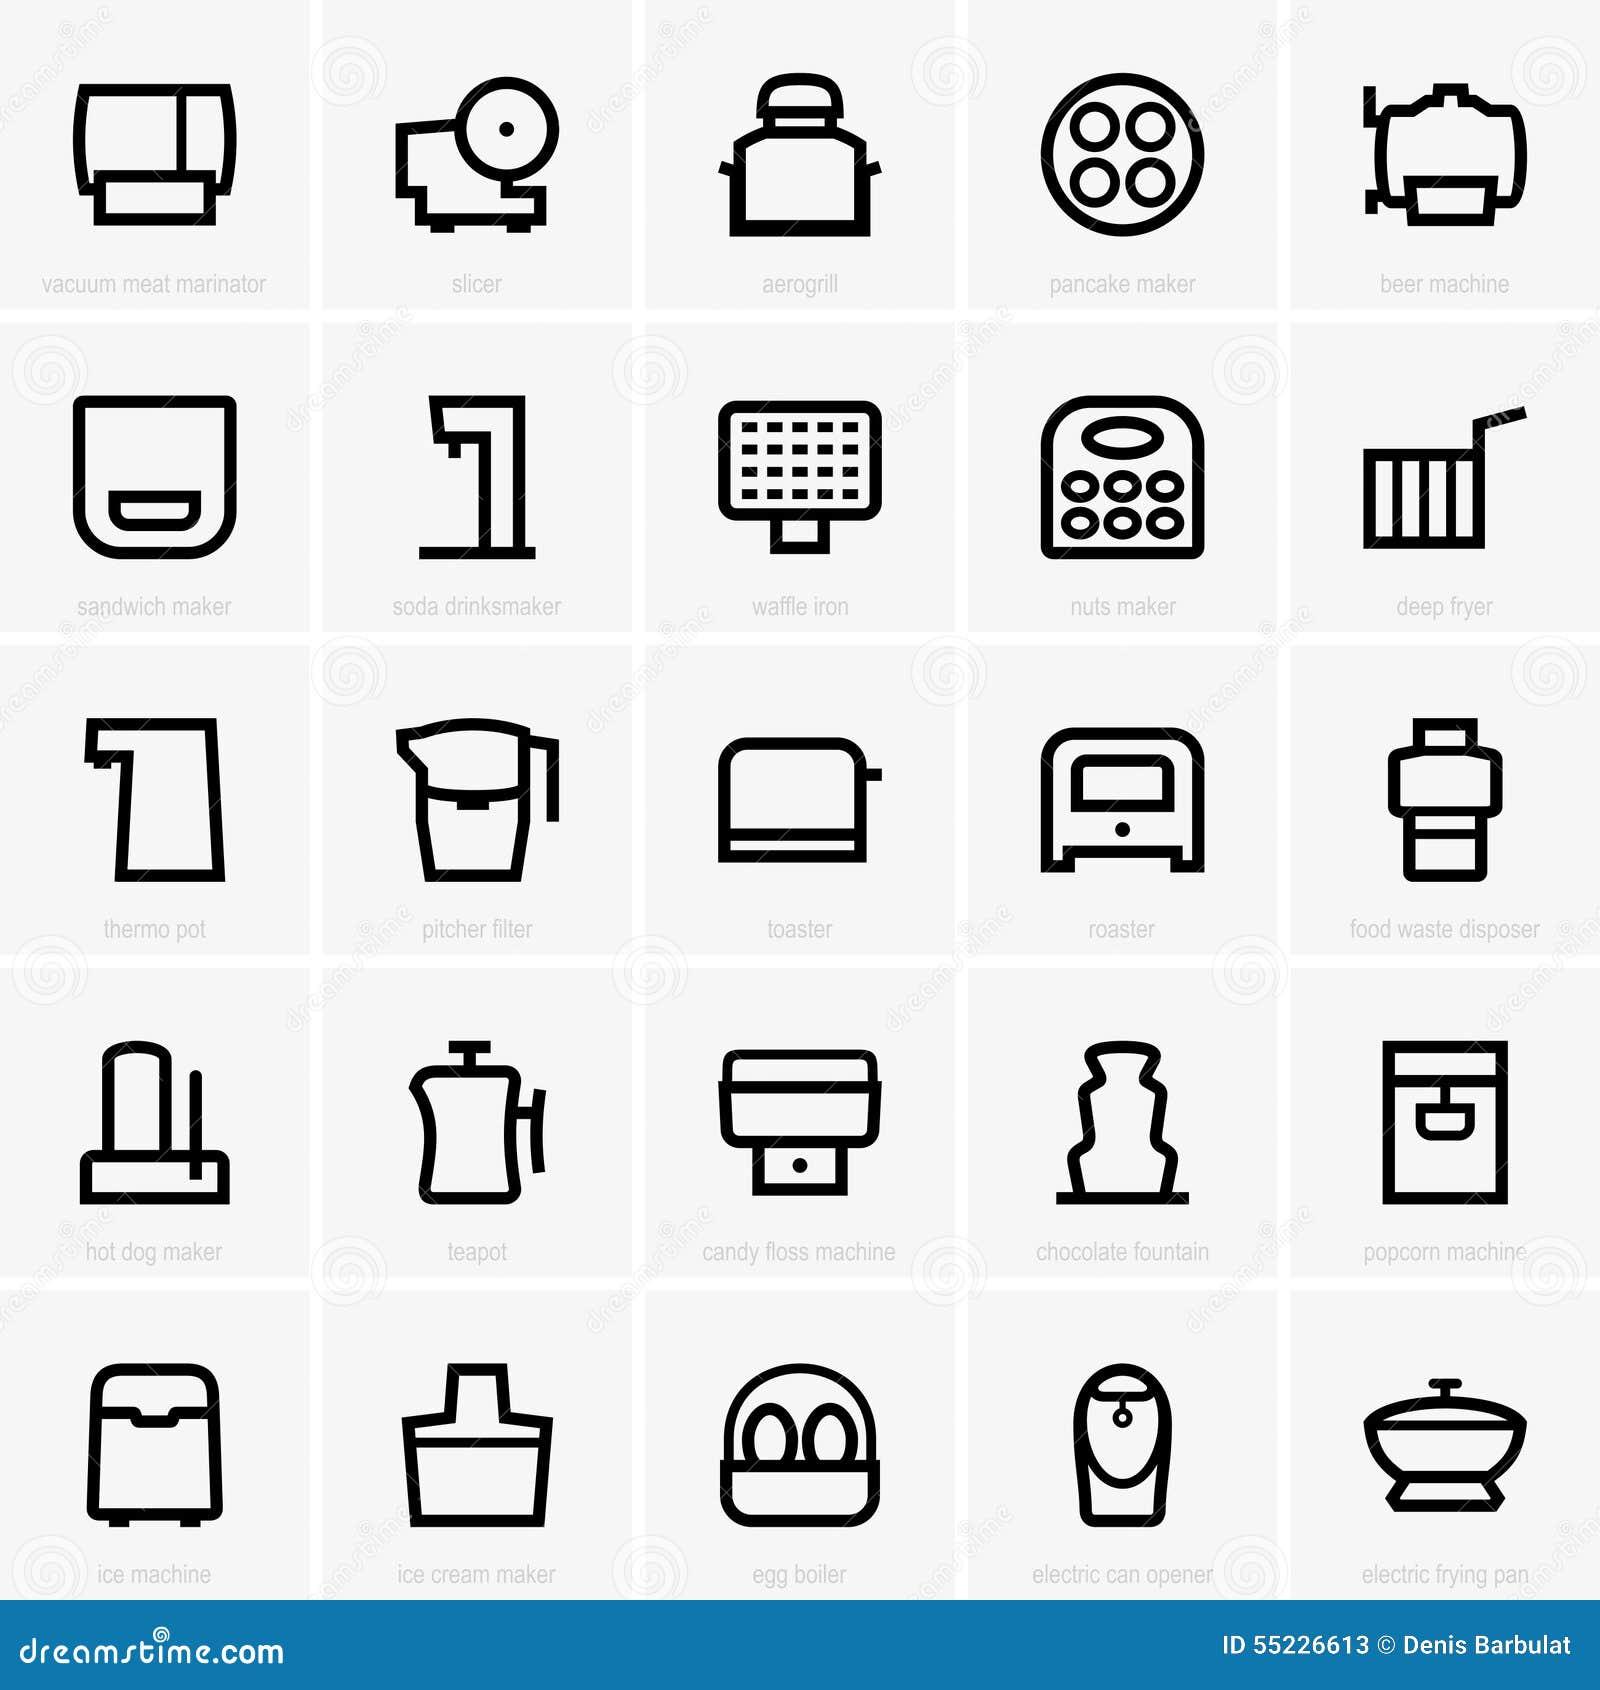 Kitchen icons (part 2)